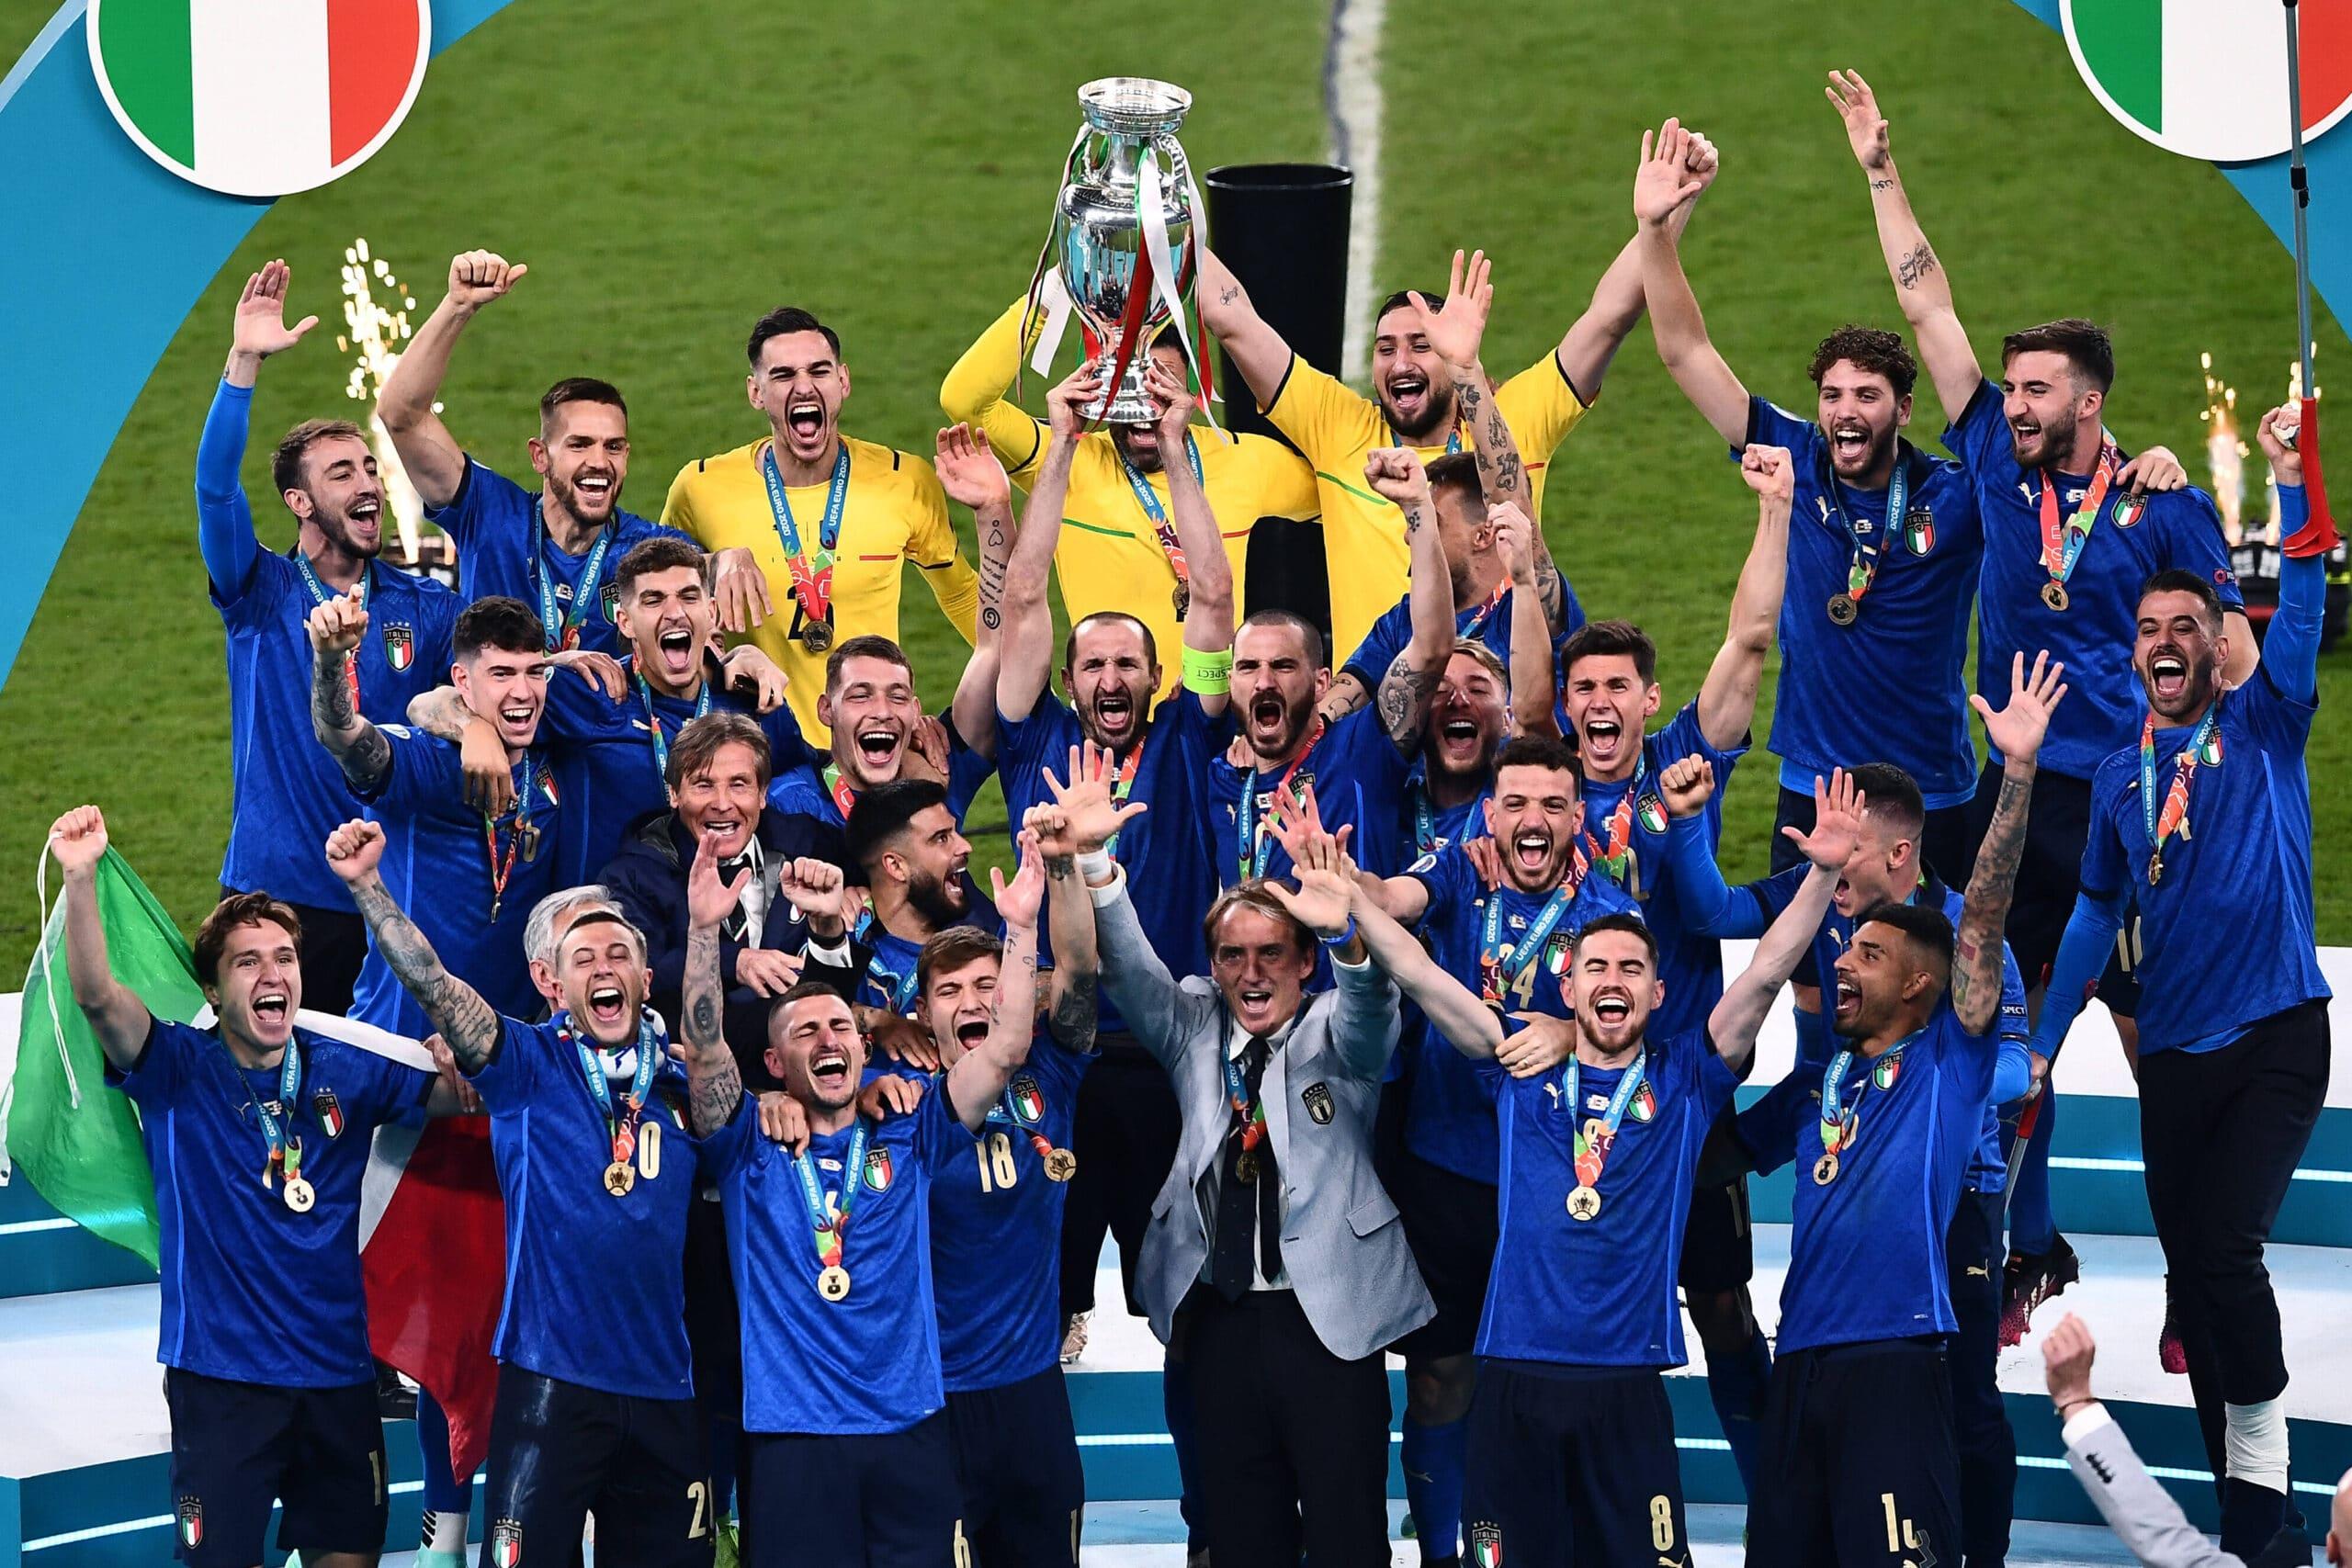 Italie 🇮🇹 1-1 (3-2 t.a.b) 🏴 Angleterre : les Tops et les Flops !